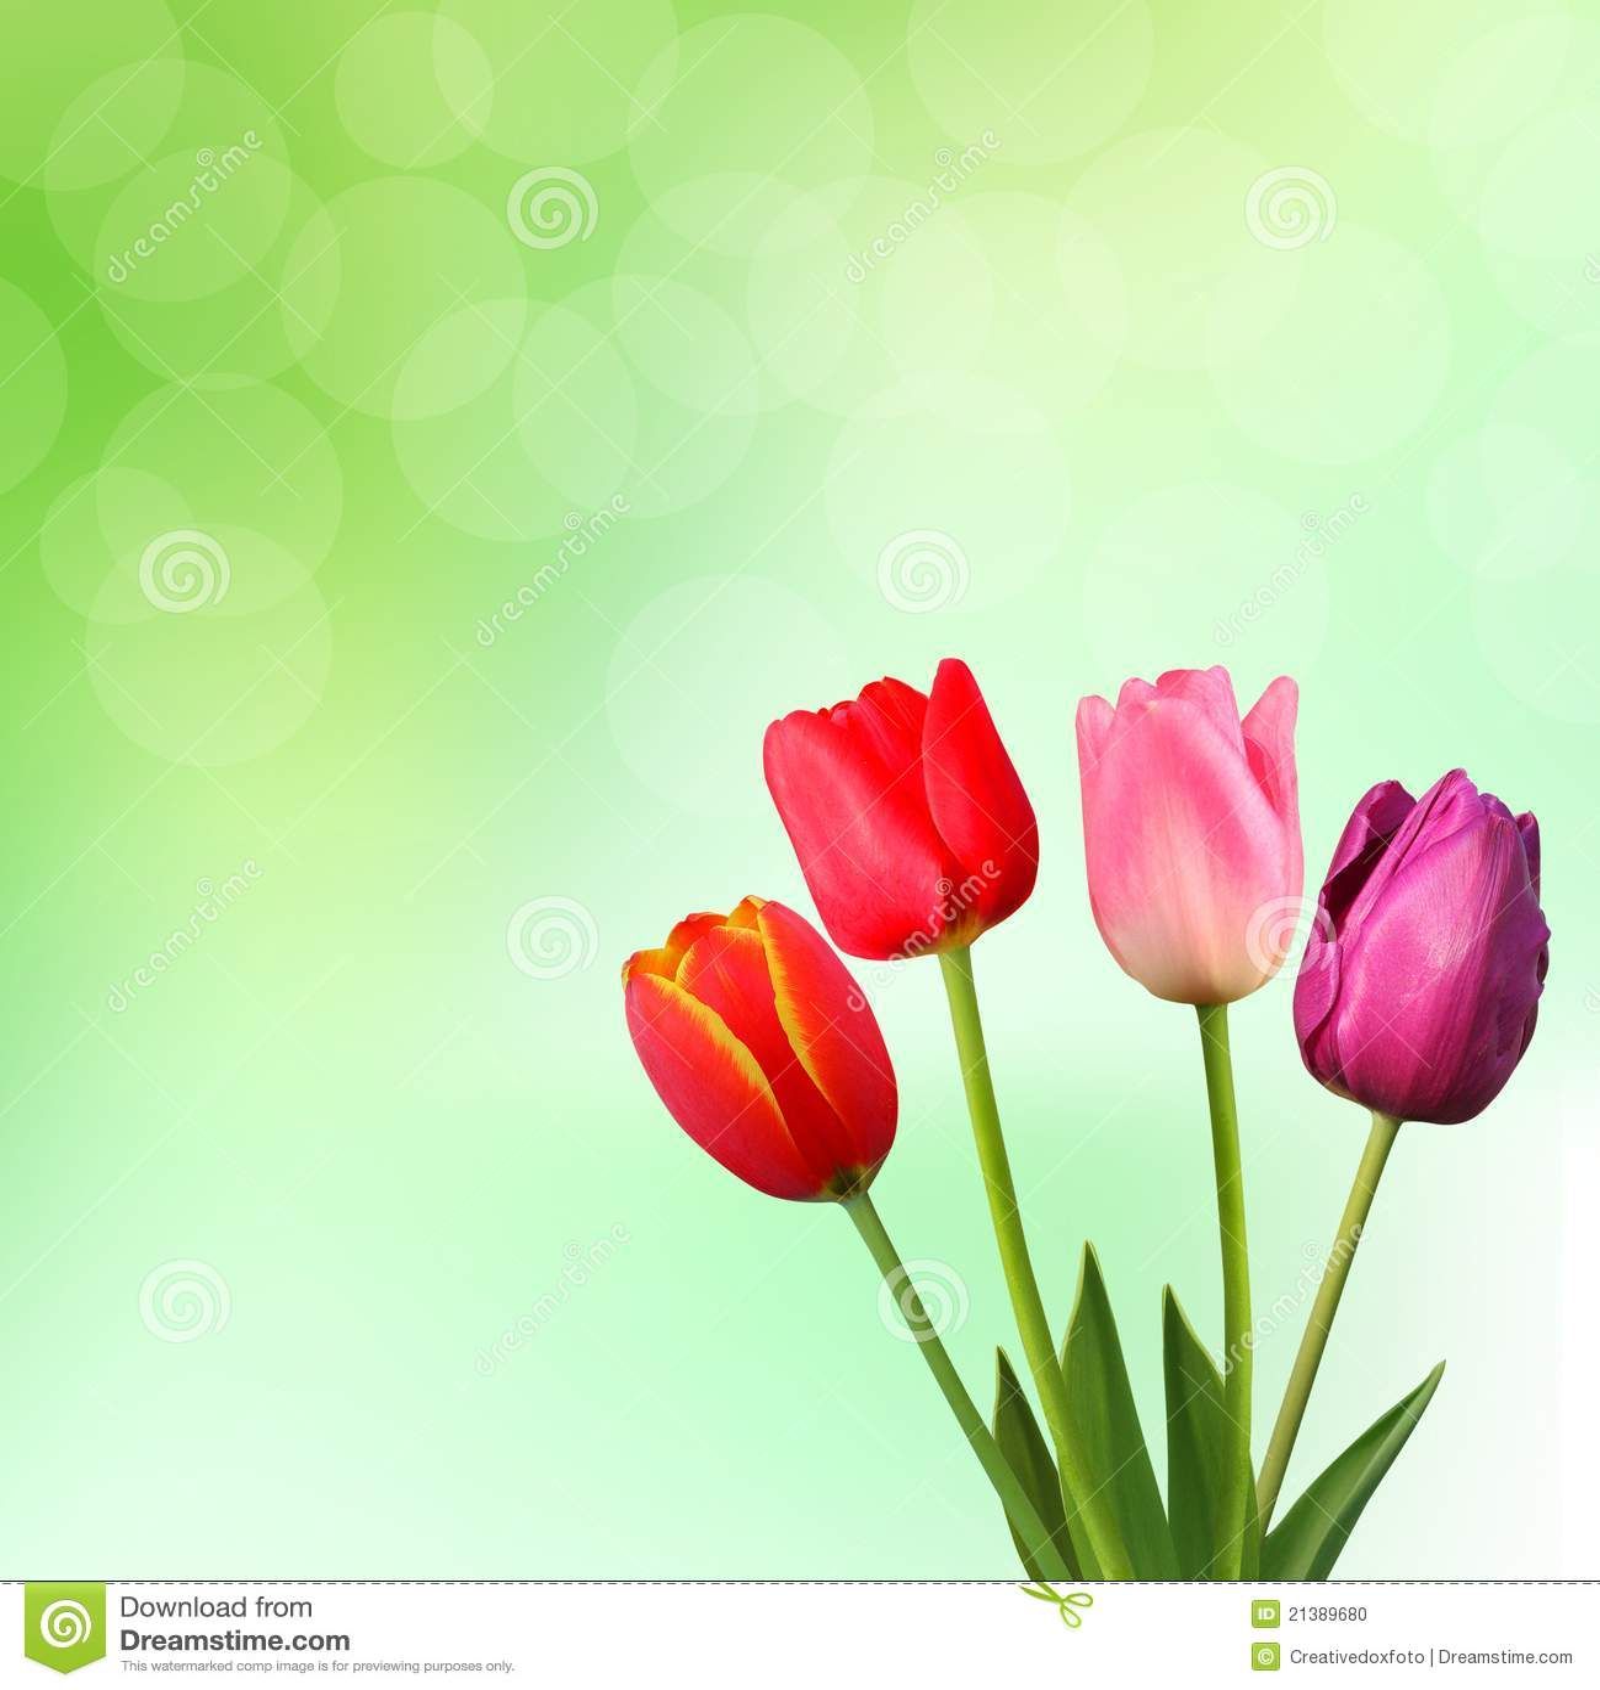 Beautiful Tulips On Green Background Stock Photo Image